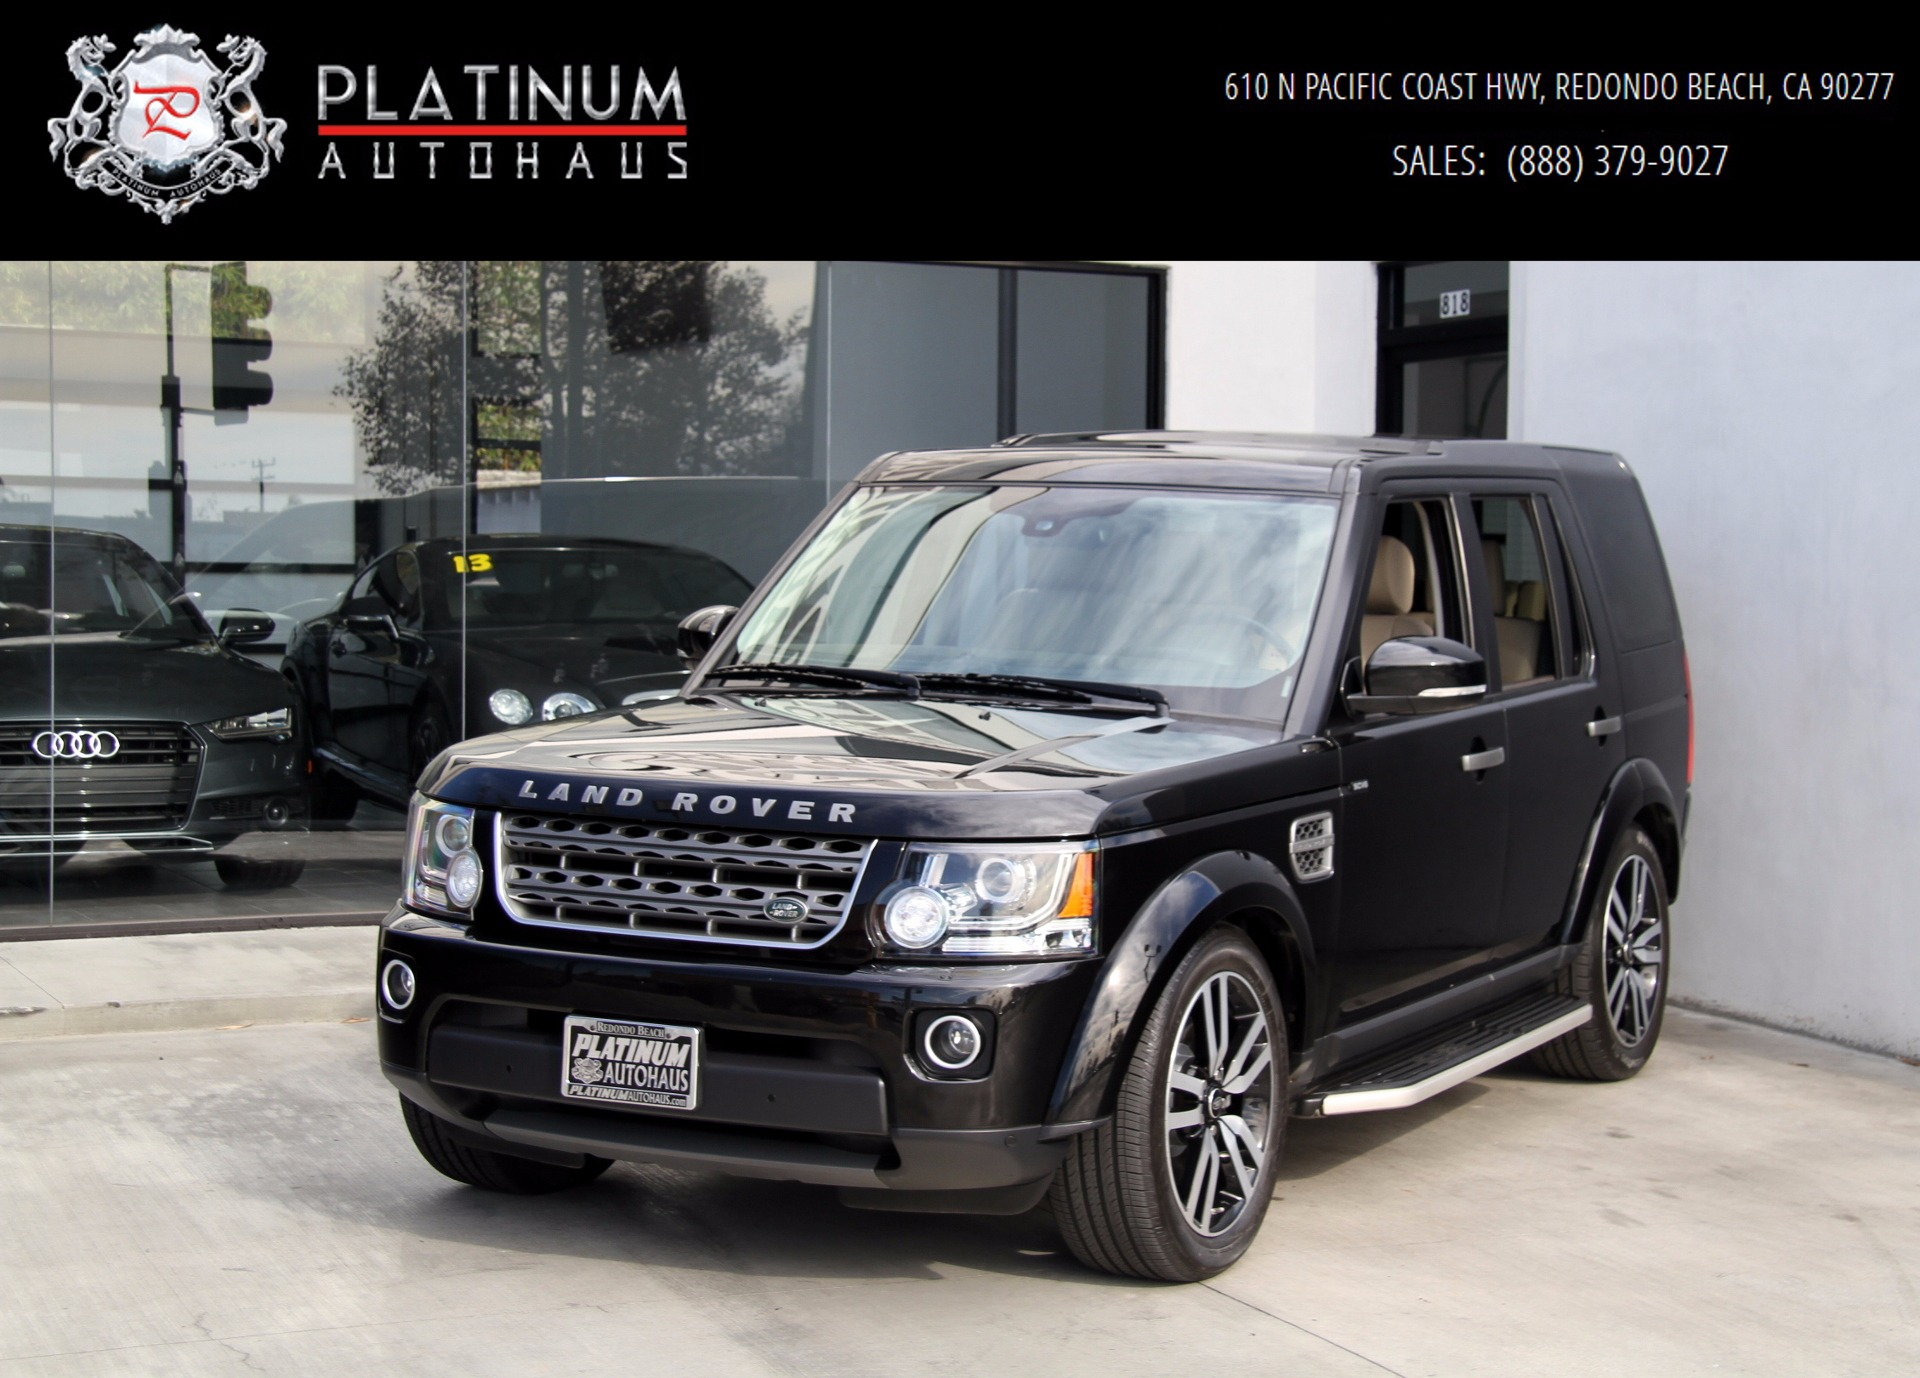 2015 Land Rover LR4 HSE Stock 6046 for sale near Redondo Beach